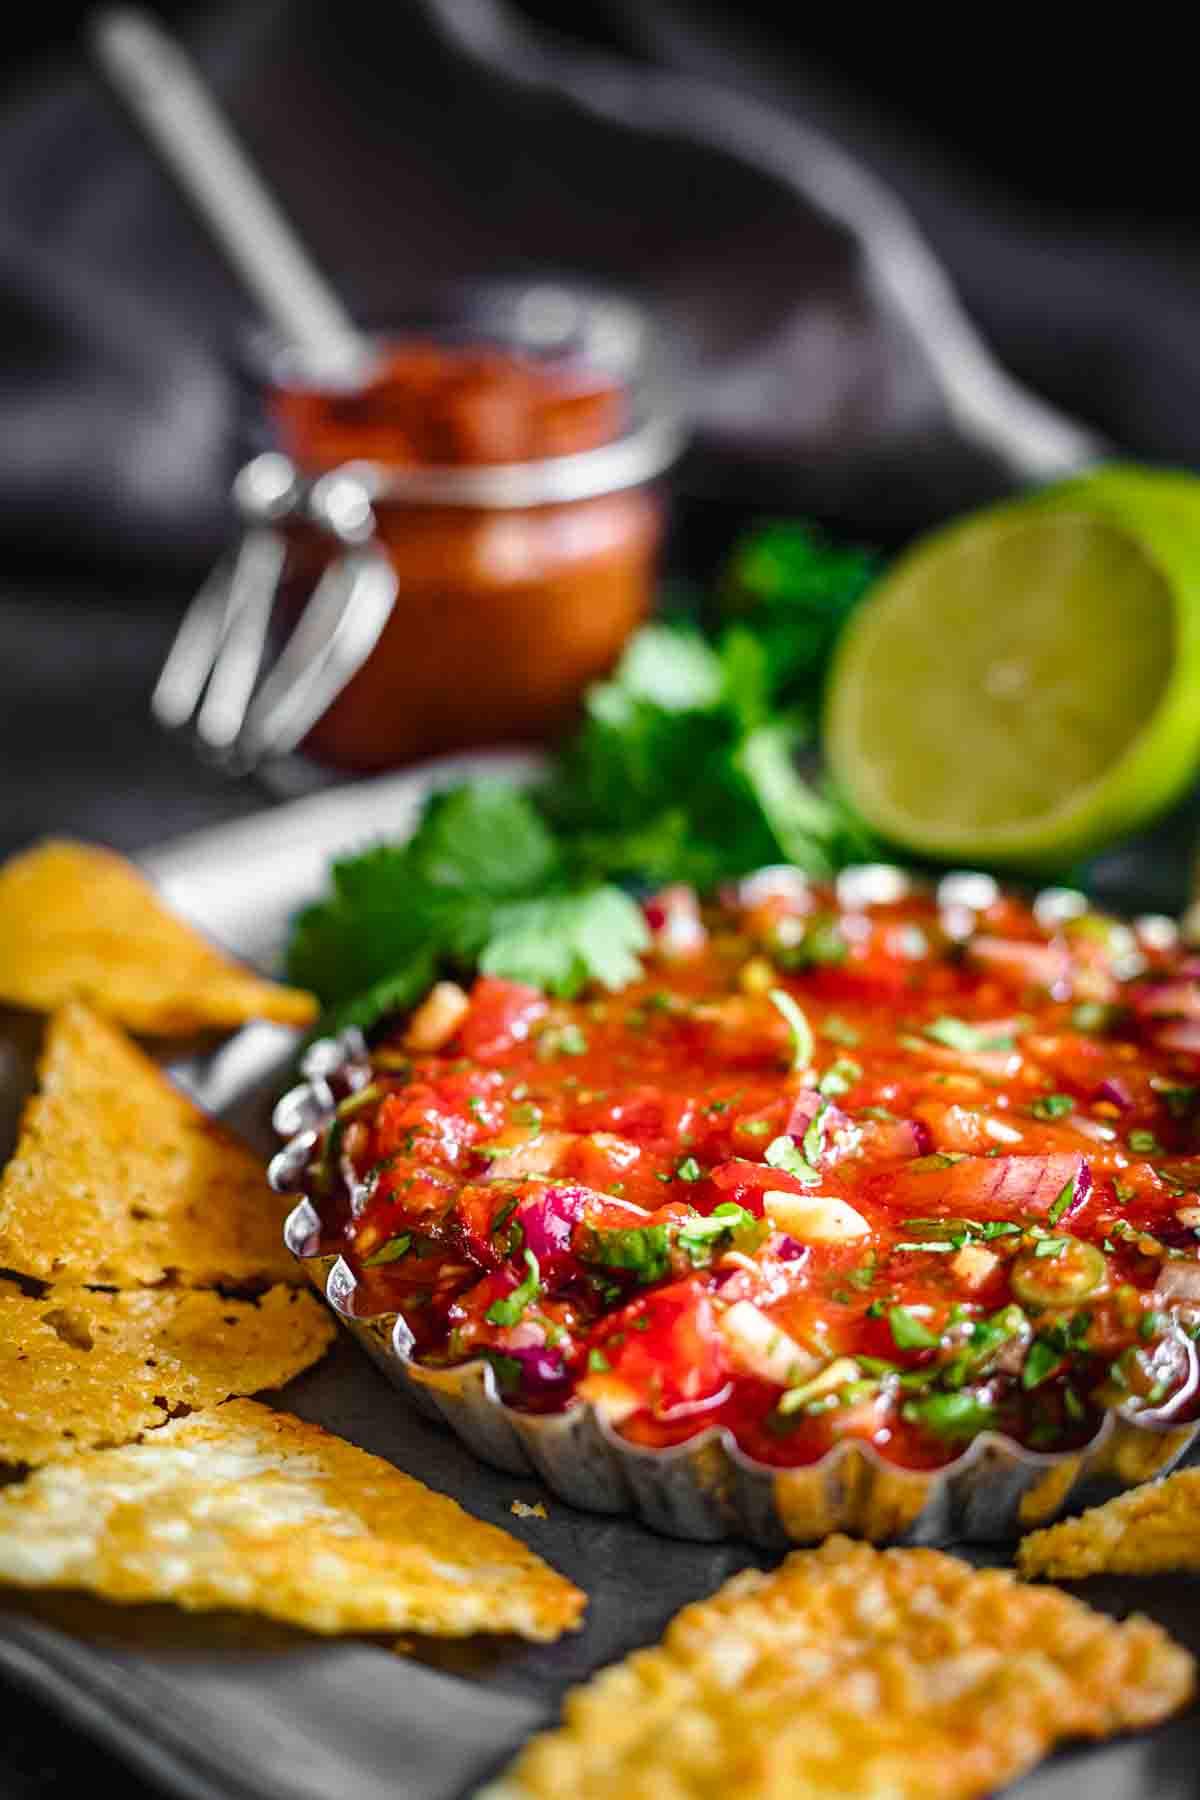 Gluten Free Salsa served in a metal bowl